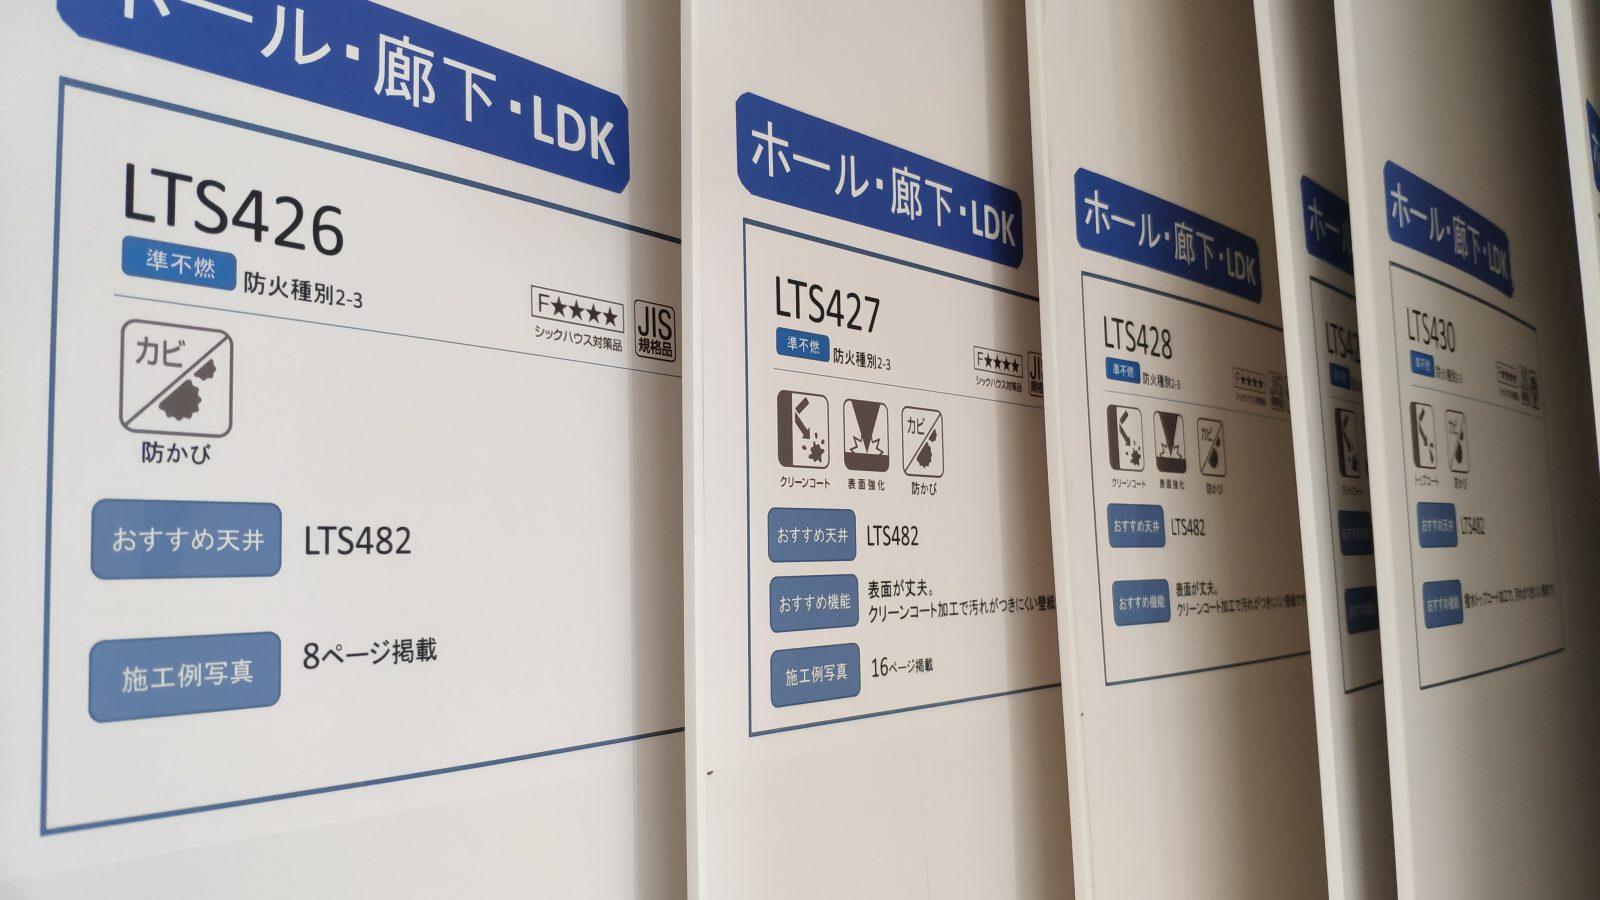 LTS426〜LTS428